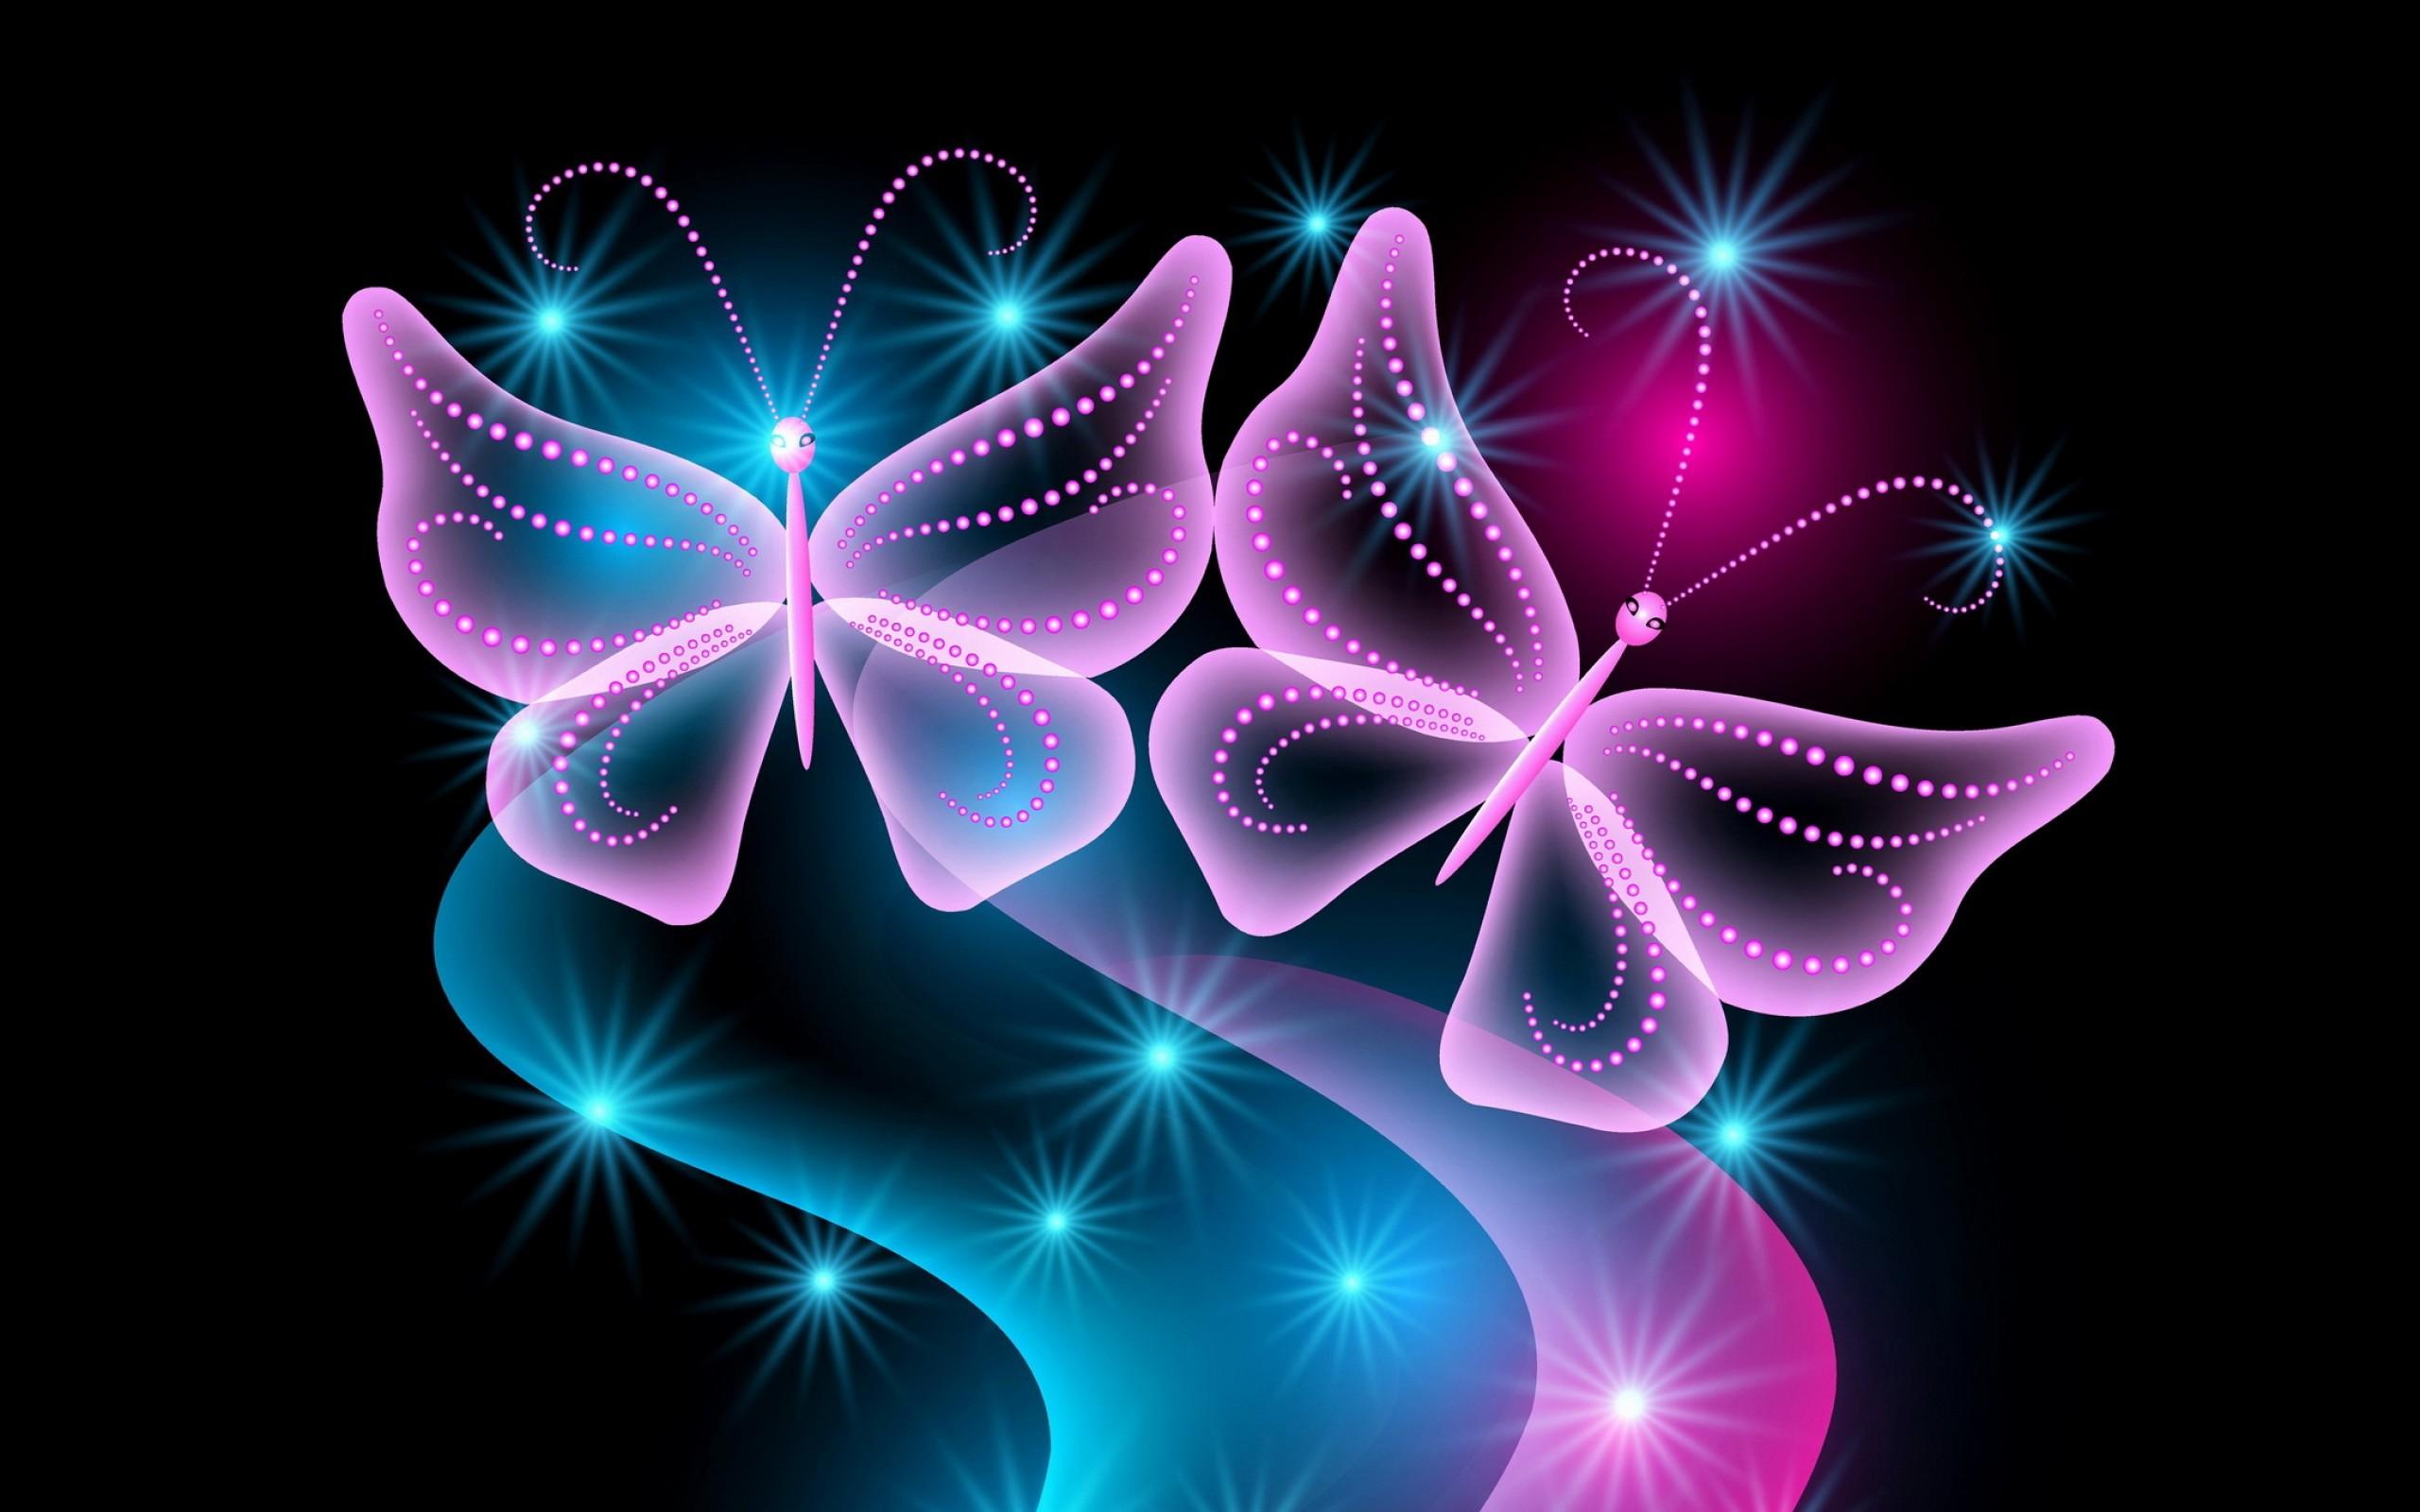 HD Abstract Neon Wallpapers | Butterfly Neon Wallpapers HD Desktop  BackgroundsNeon Lights Wallpaper .